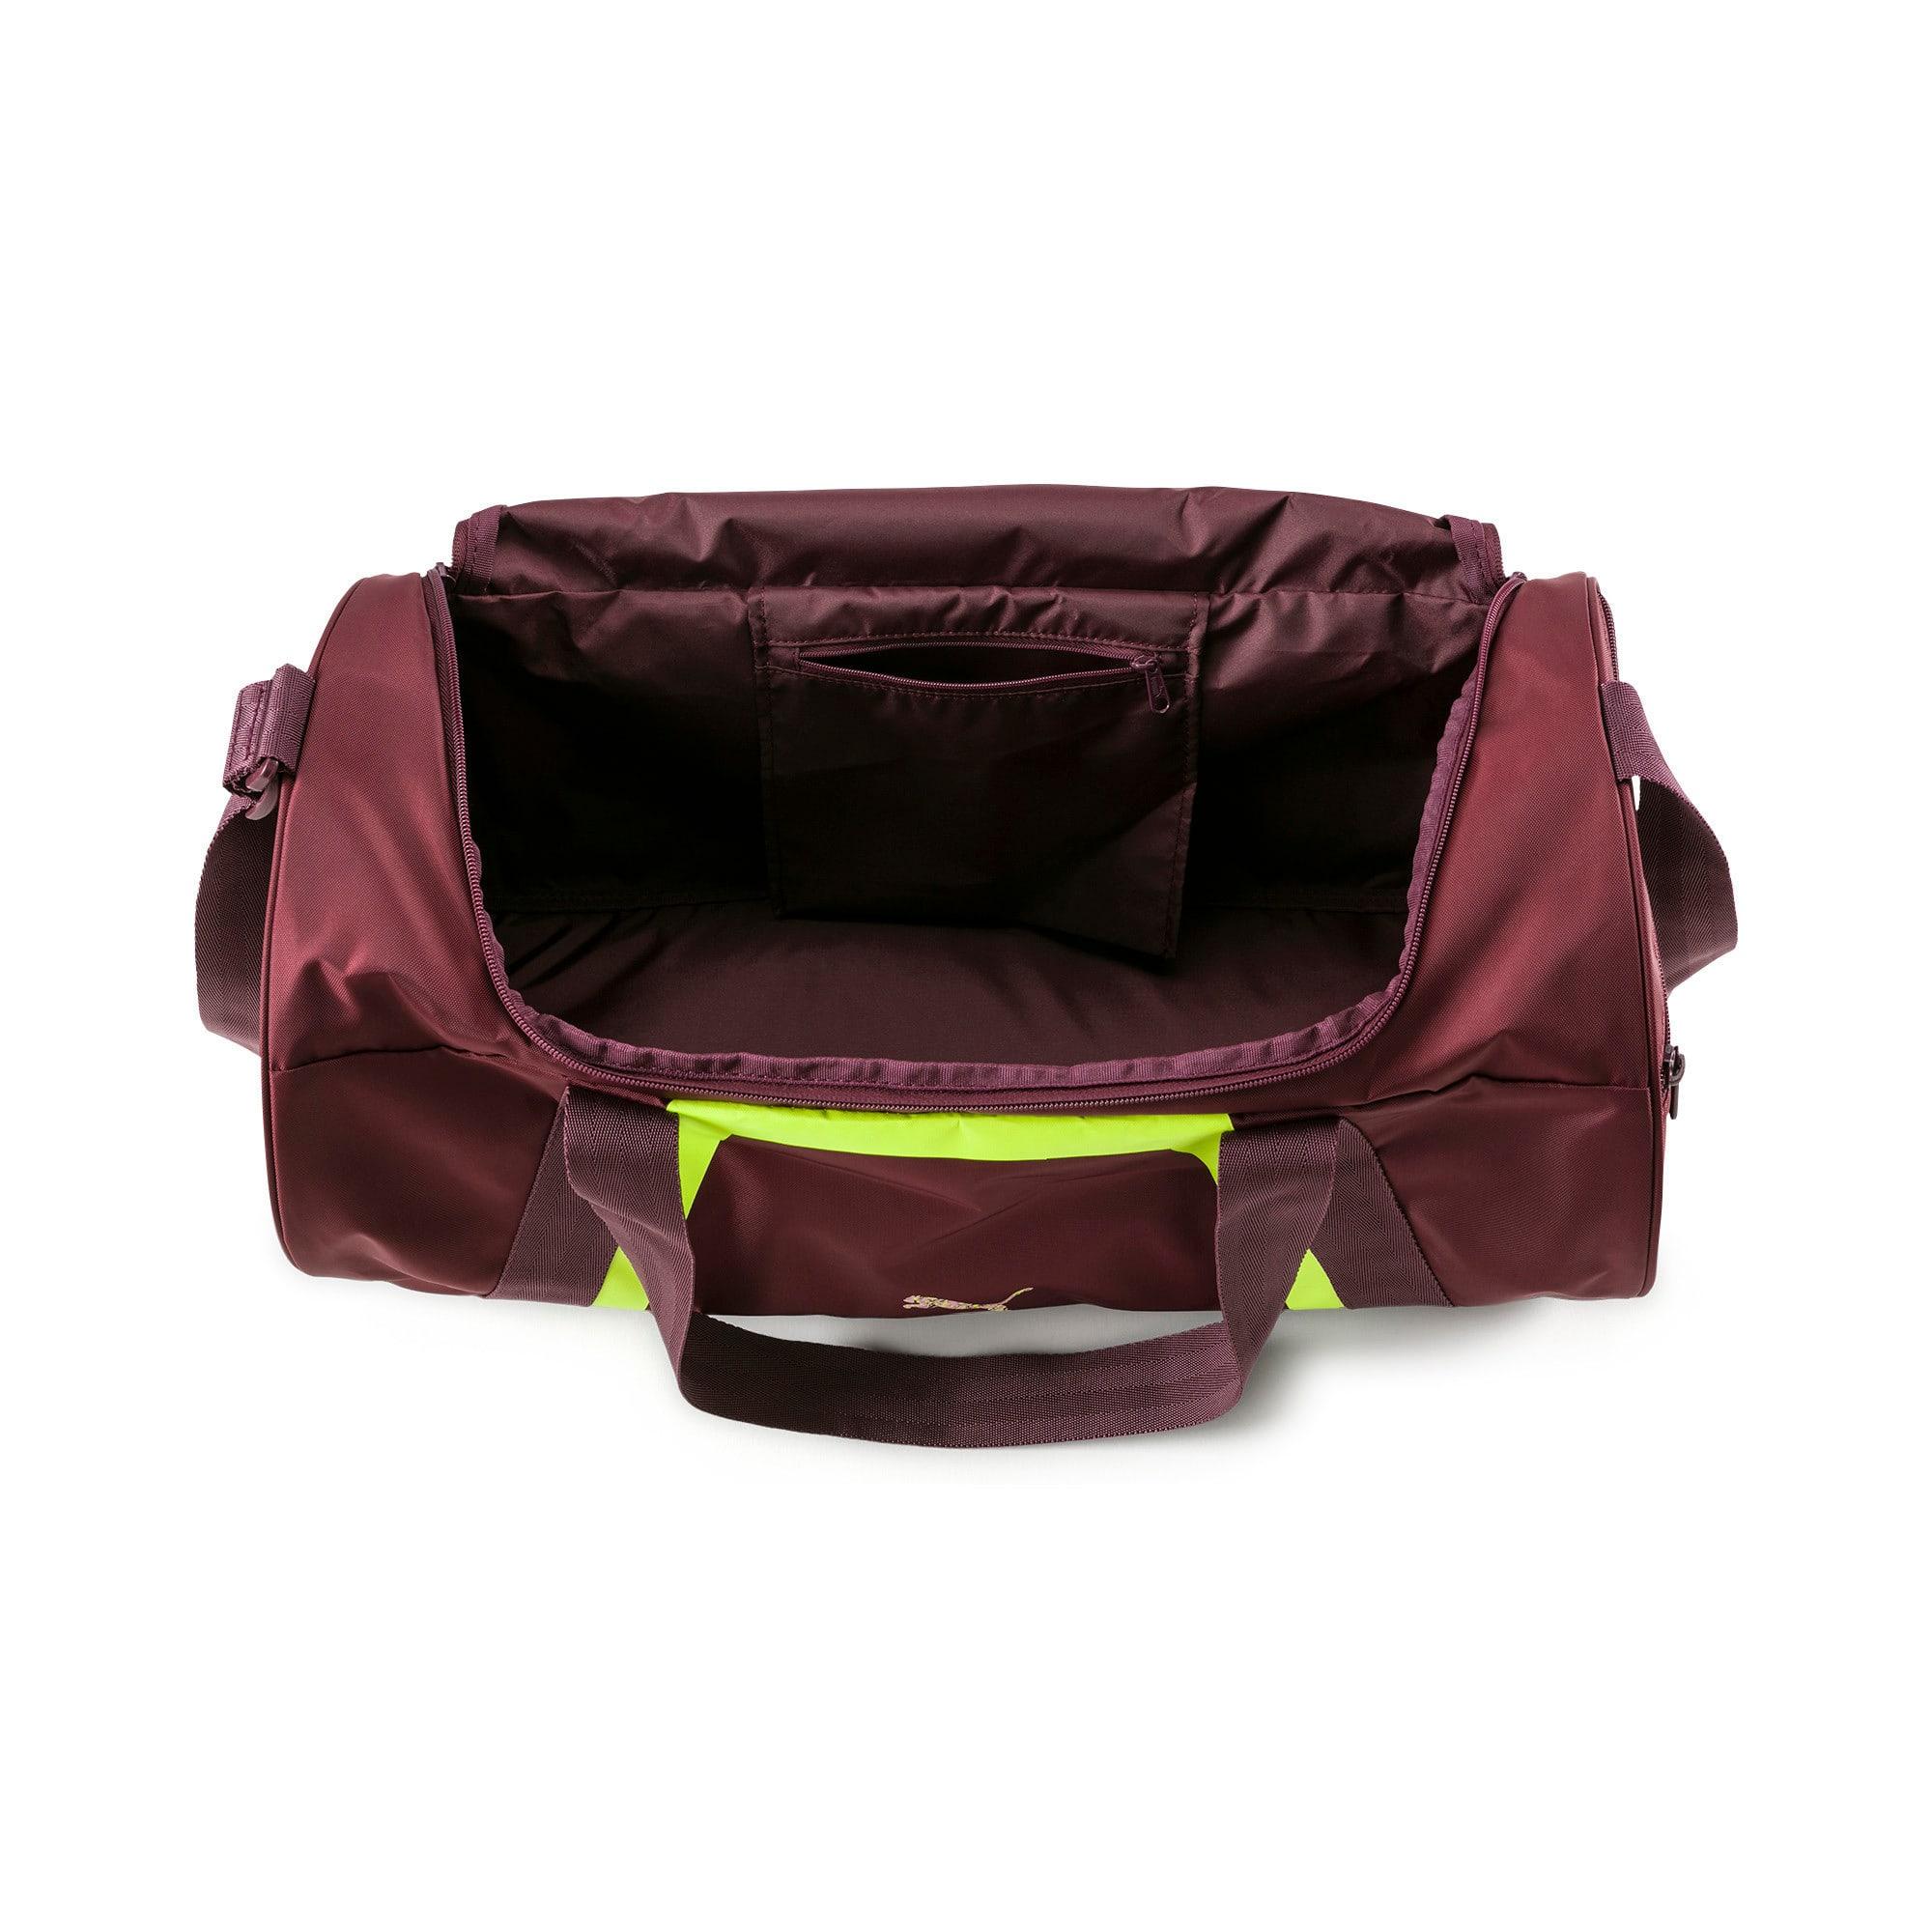 Thumbnail 4 of Active Training Shift Women's Duffel Bag, Vineyard Wine-Yellow Alert, medium-IND